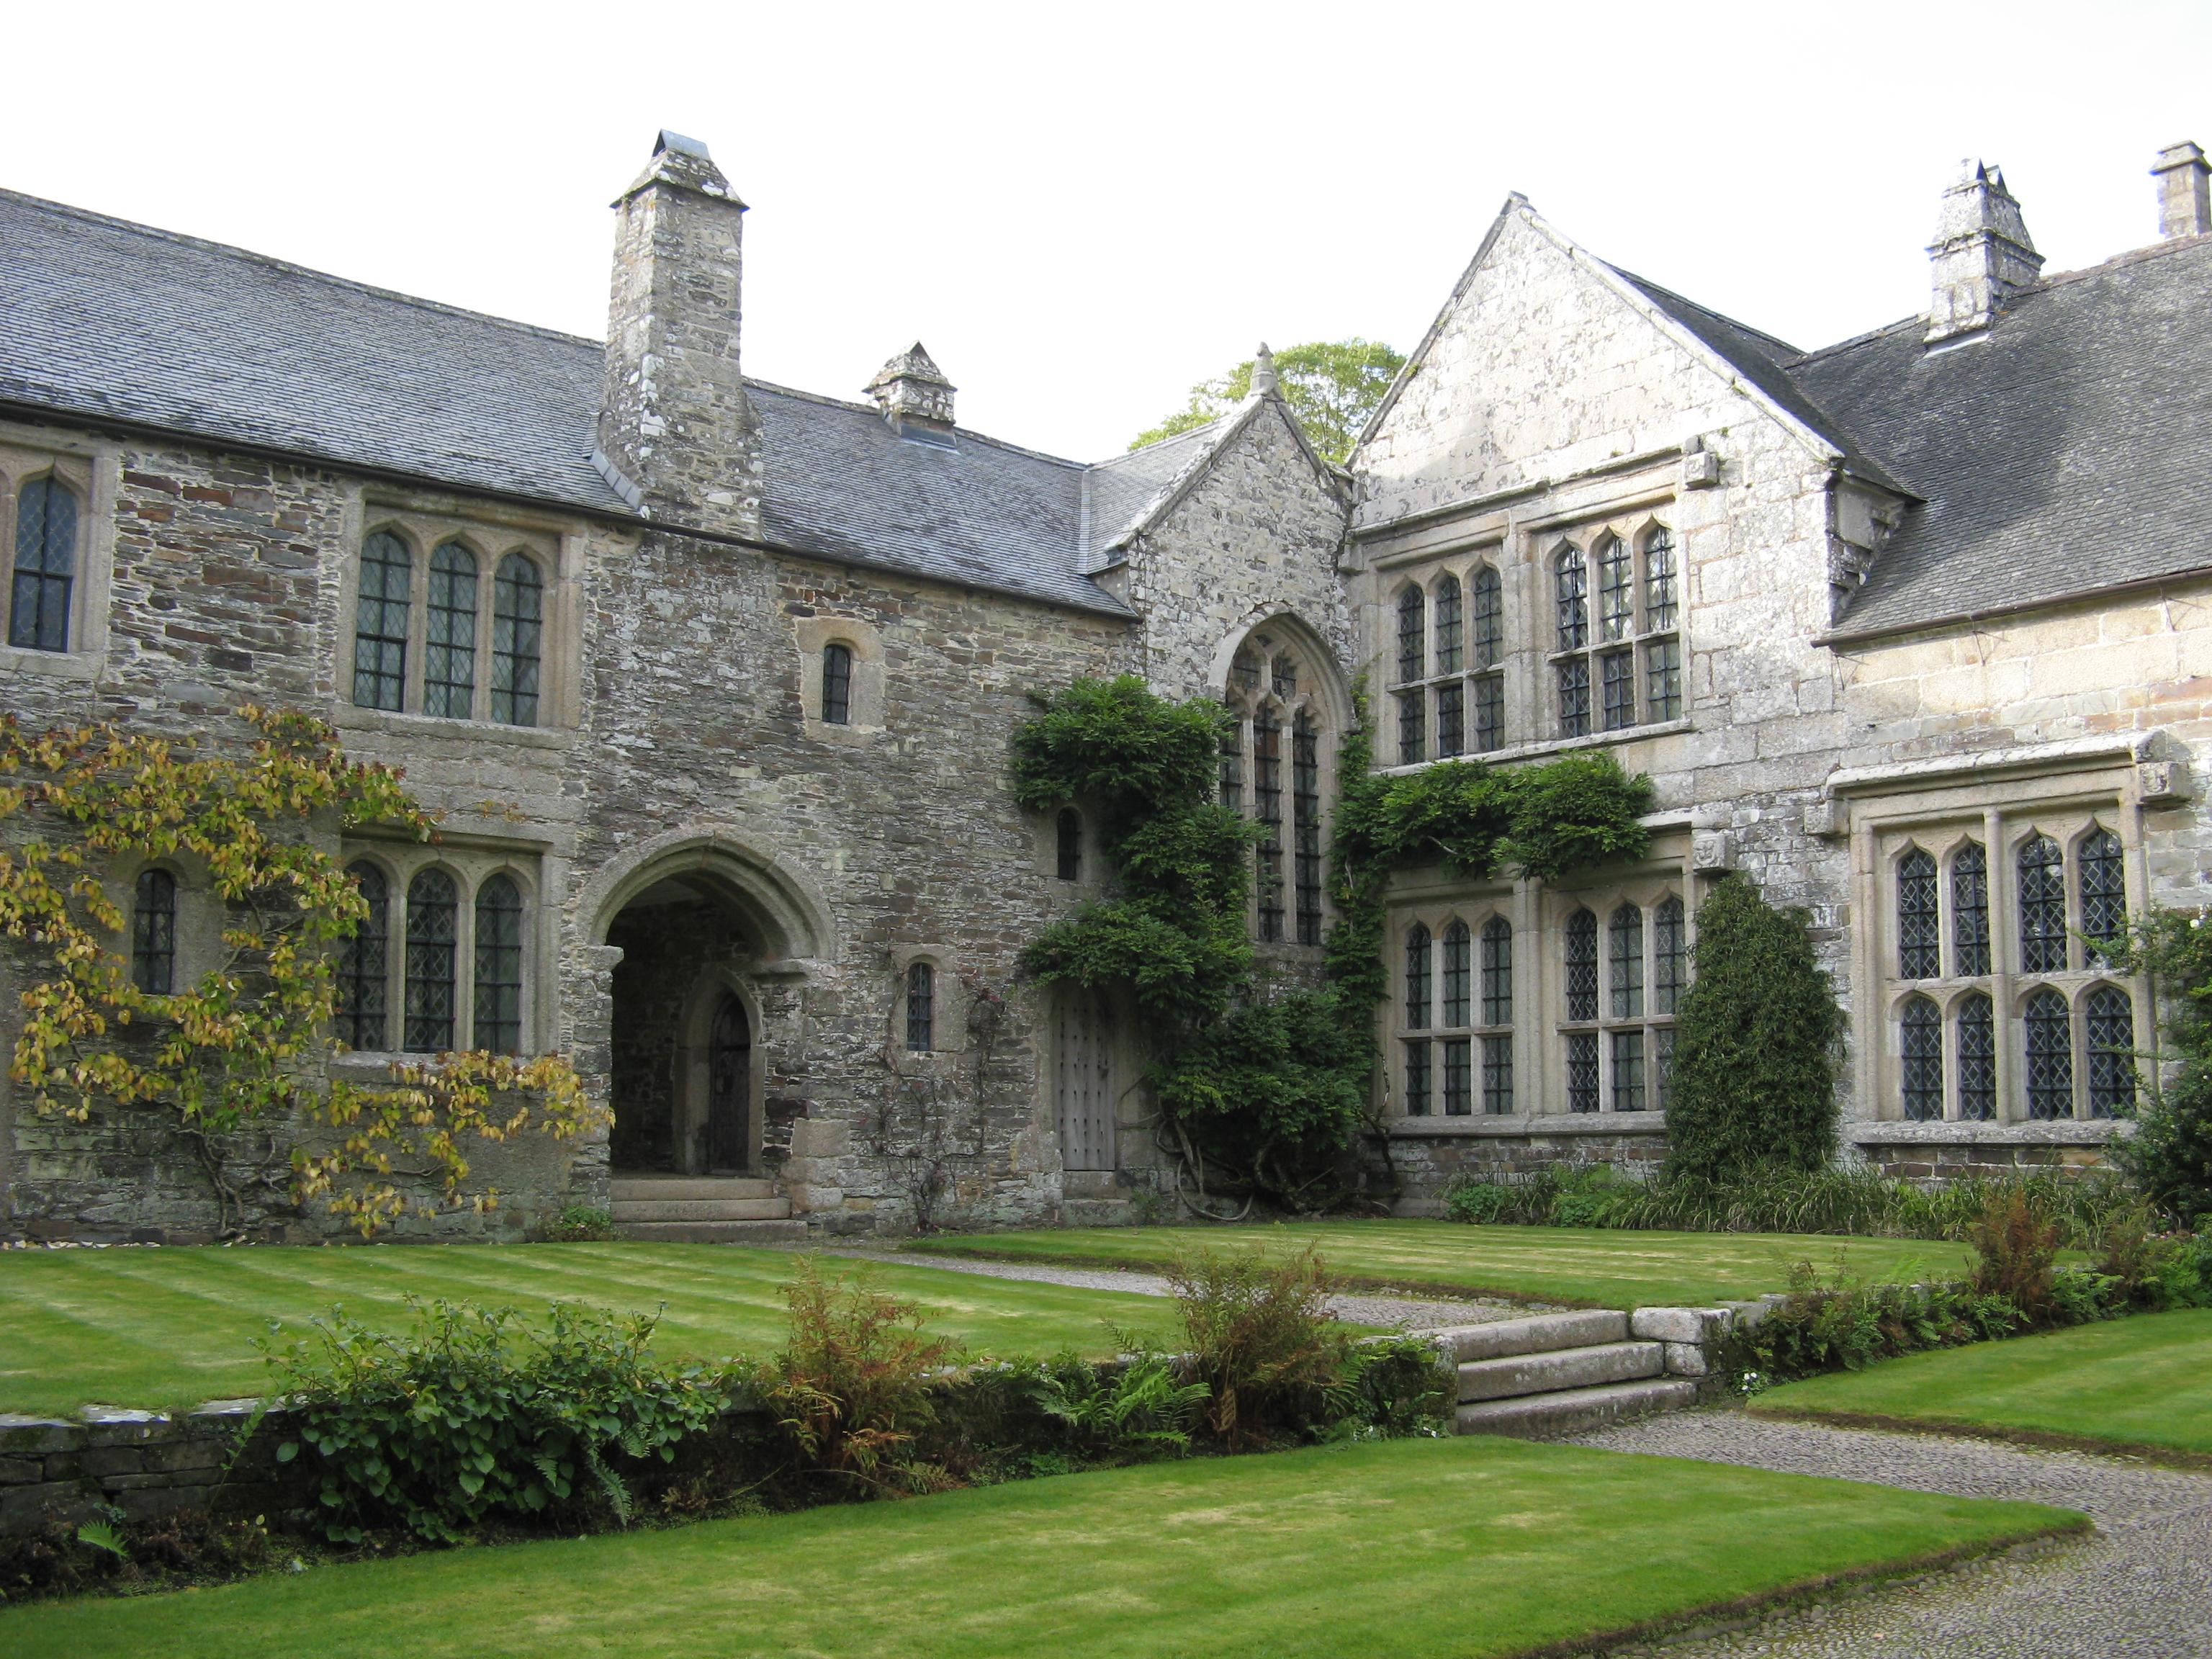 File:Cotehele, house from courtyard.jpg - Wikimedia Commons